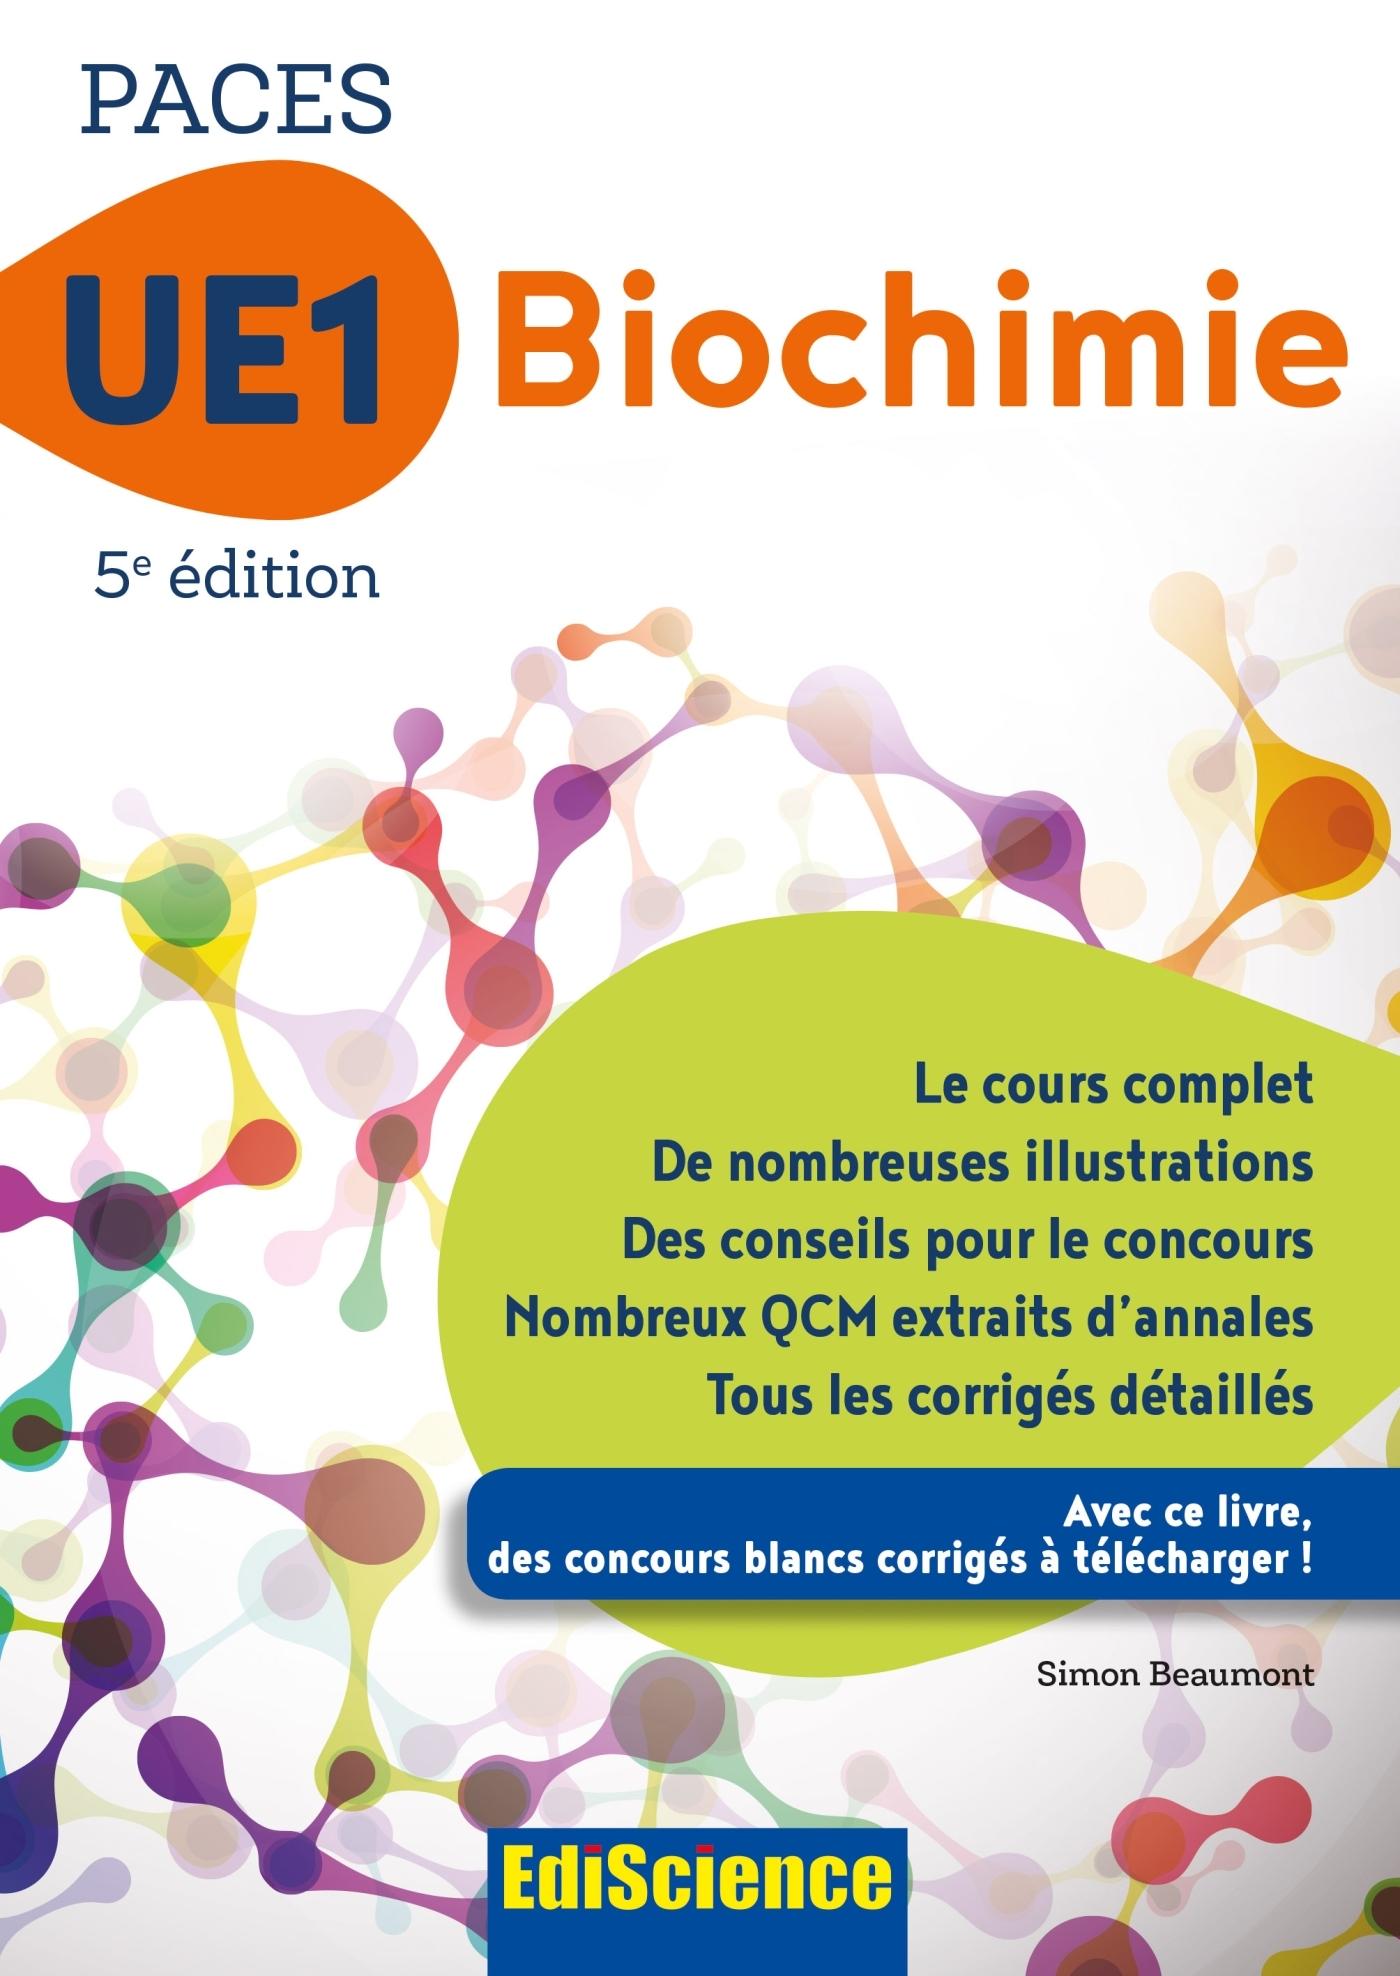 PACES UE1 BIOCHIMIE - 5E ED. - 1 - UE1 - T1